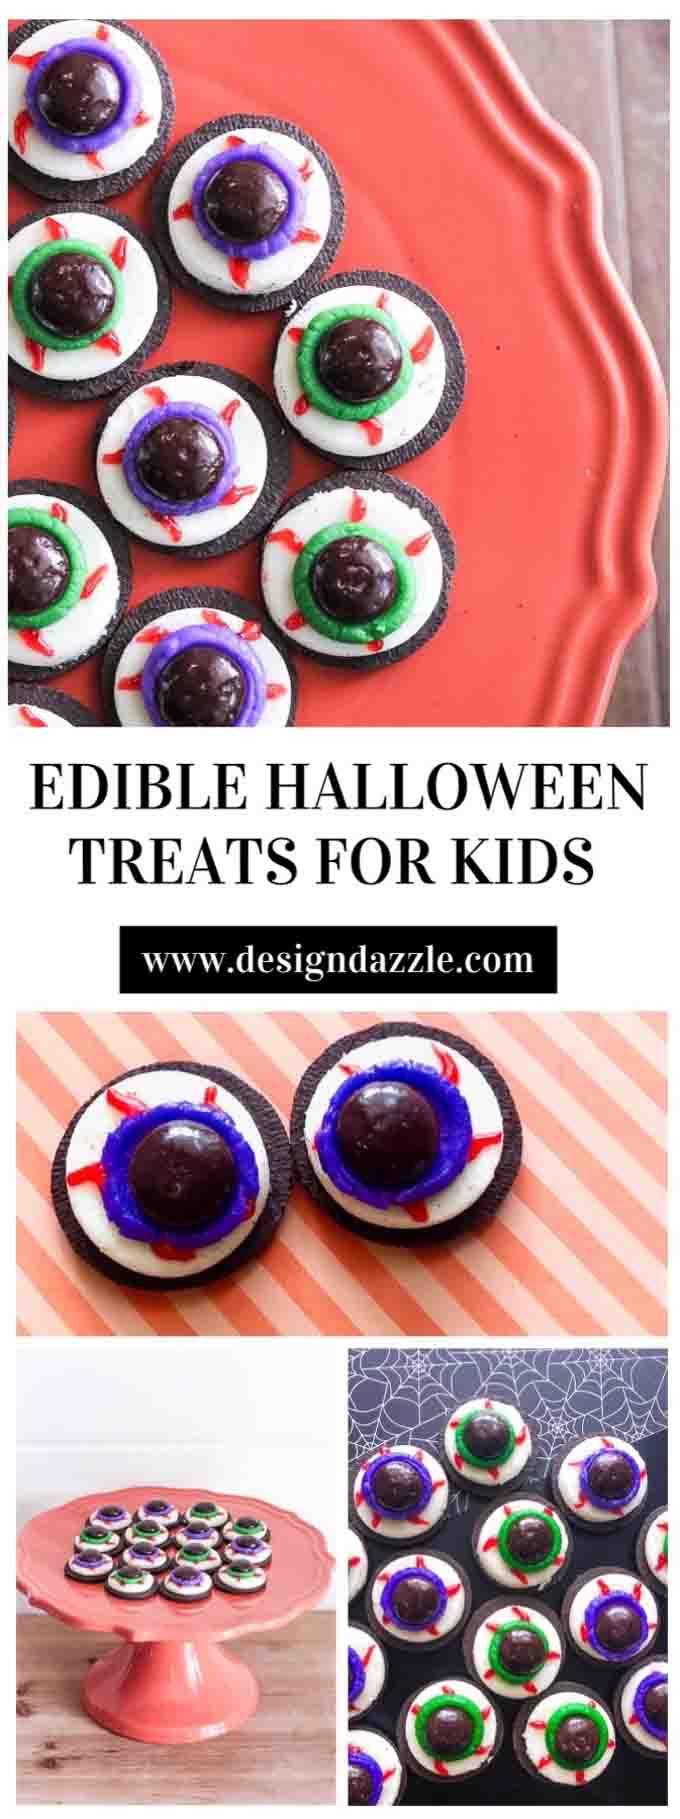 Edible halloween treats for kids 11